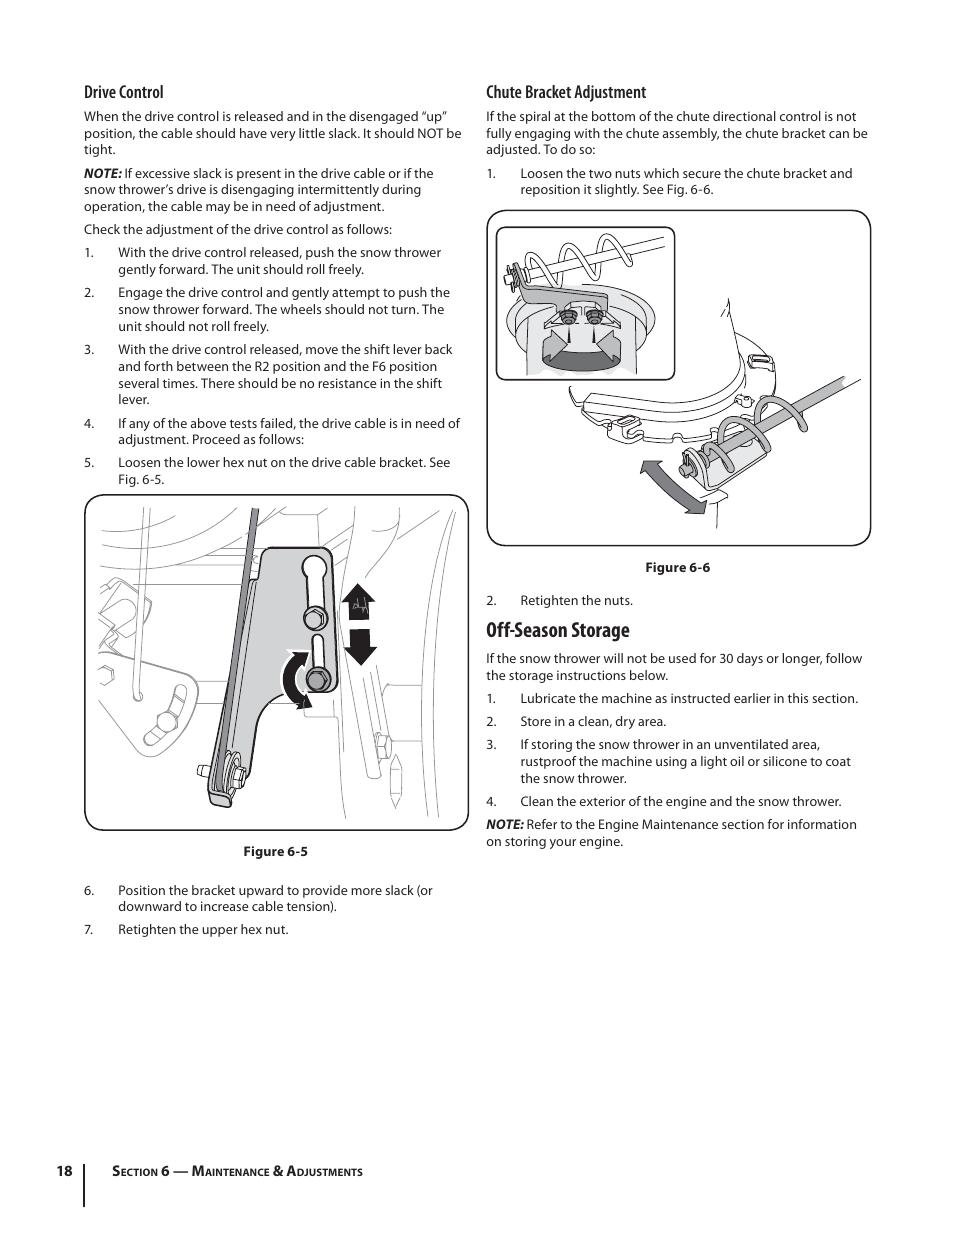 Off-season storage, Drive control, Chute bracket adjustment   Troy-Bilt  Storm 2410 User Manual   Page 18 / 60